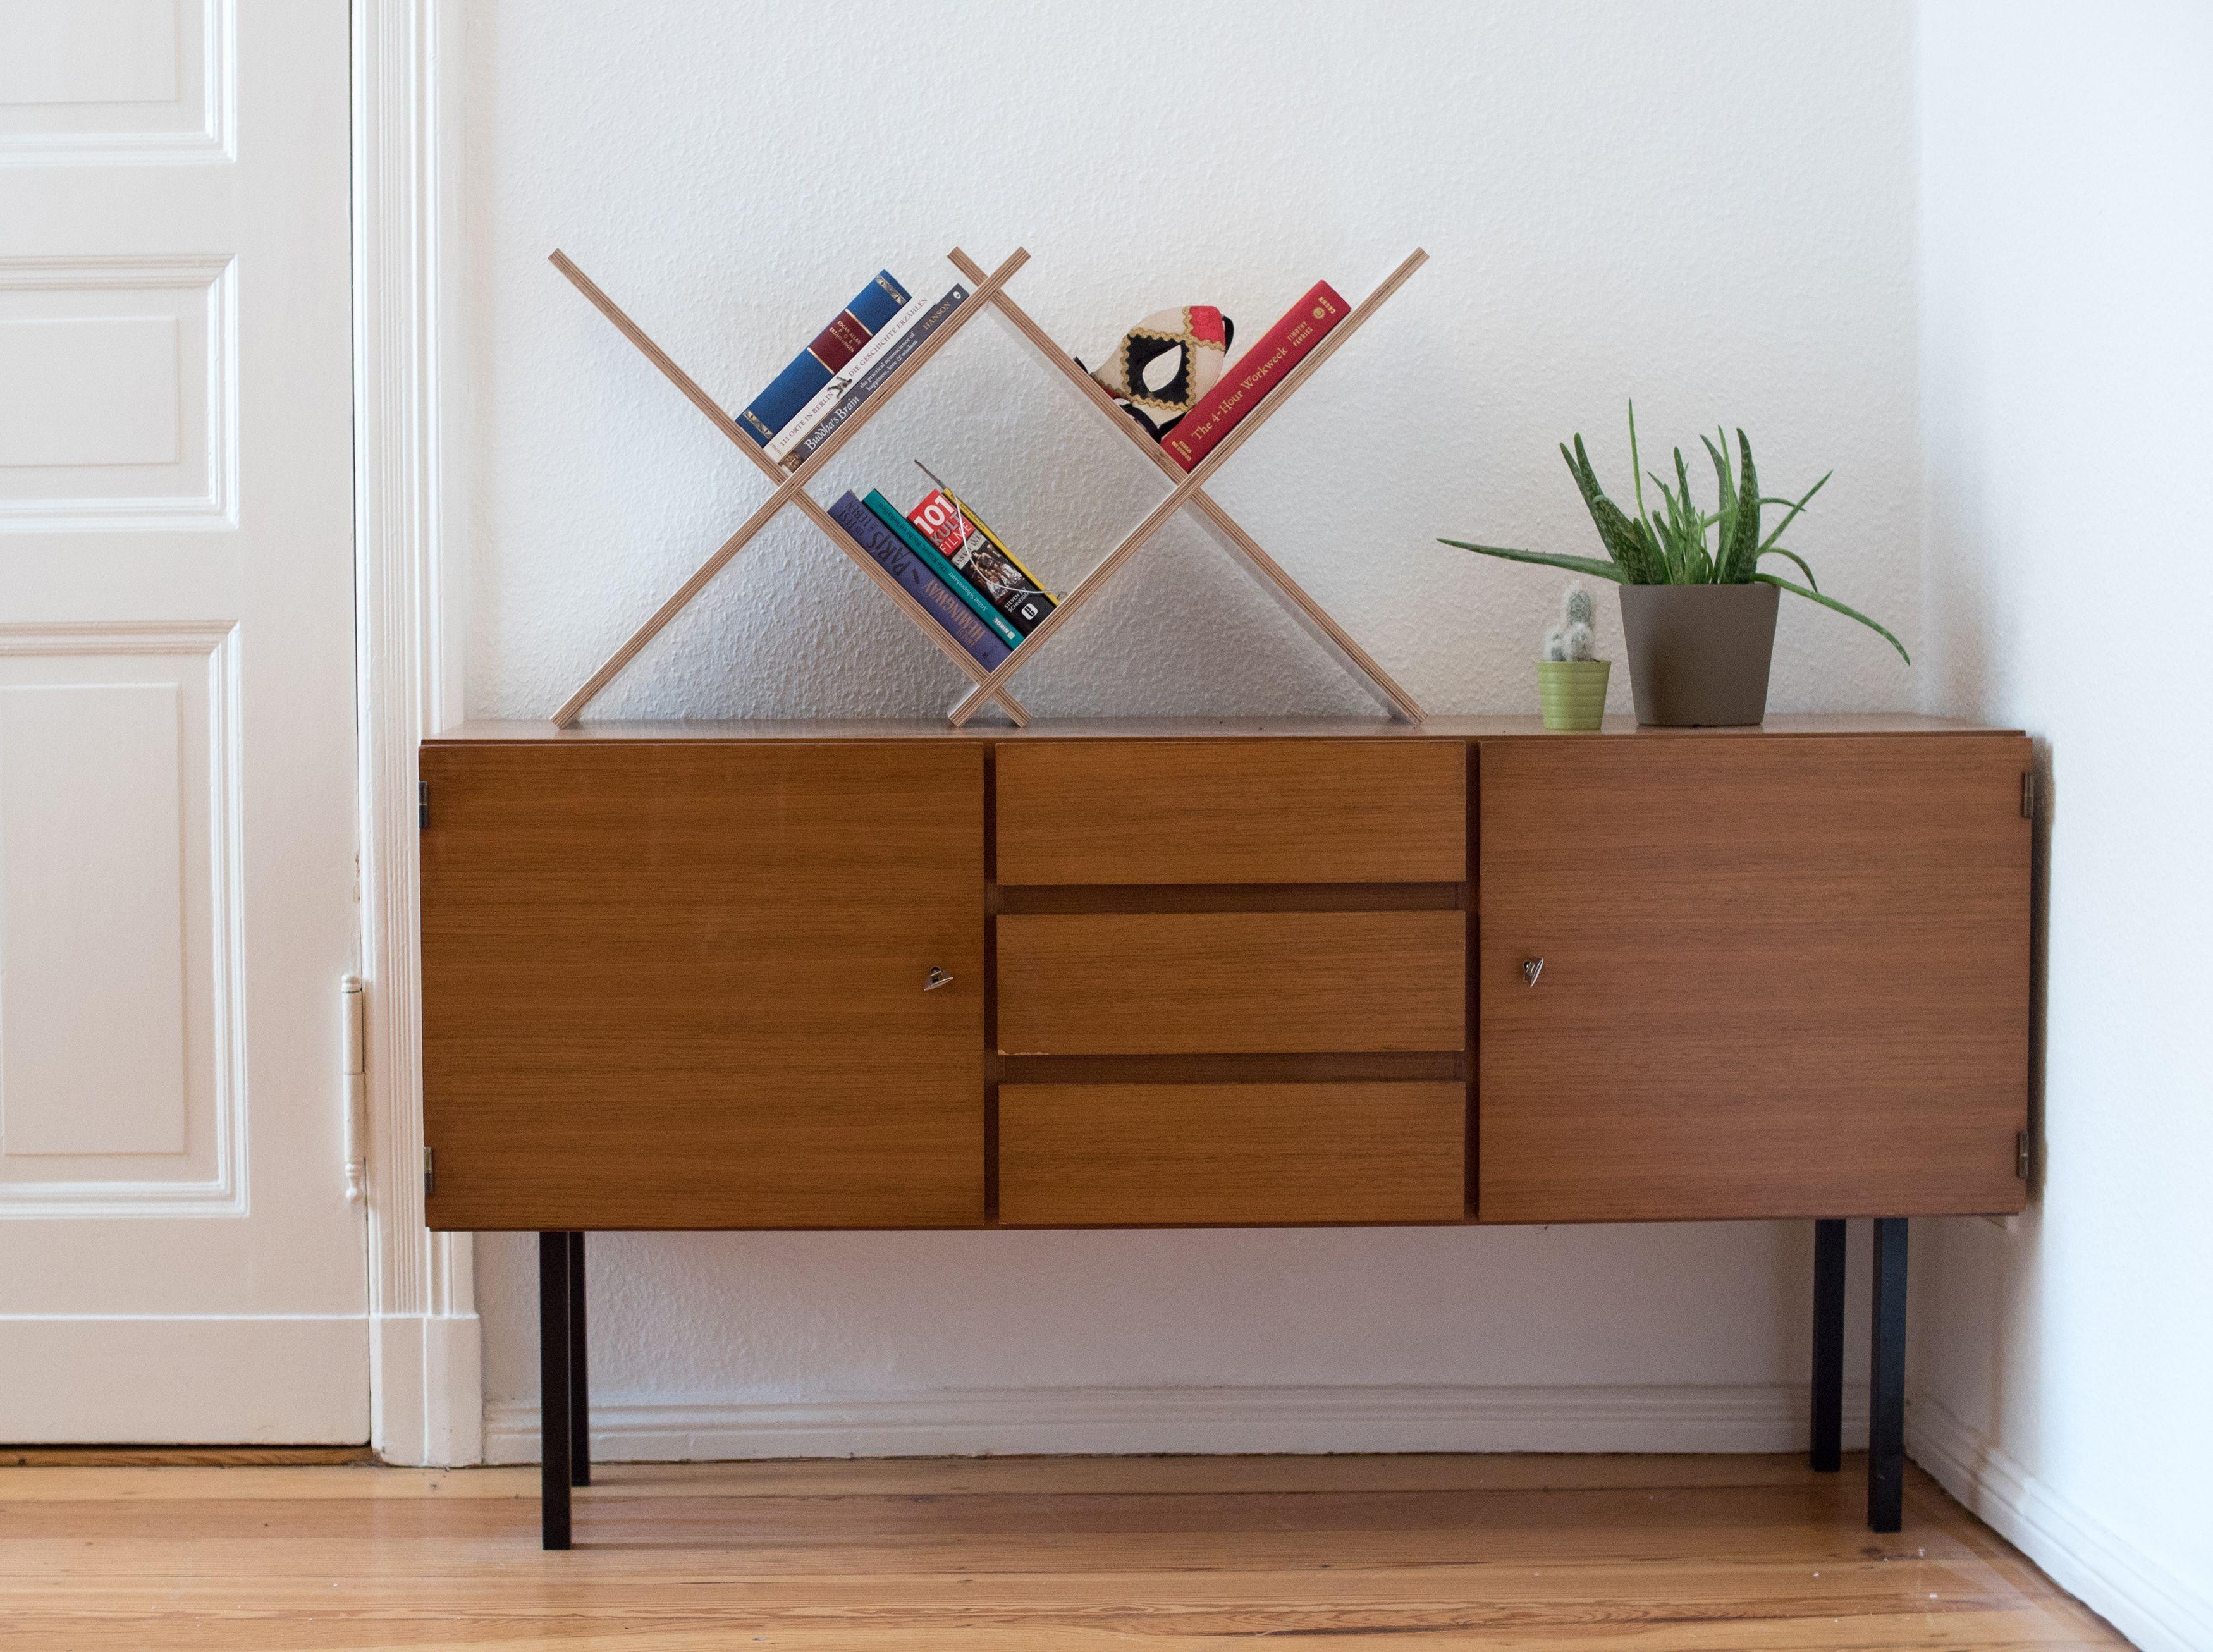 #XBoard #HermannHermann #nomadicfurniture #shelf #interiordesign #minimalism #books #pluggable / also on @monoqi  #monoqi @homifyde  #homify @selekkt  #selekkt / in @Nidomagazin (issue 05/2015)  / Photo: @franksauer50